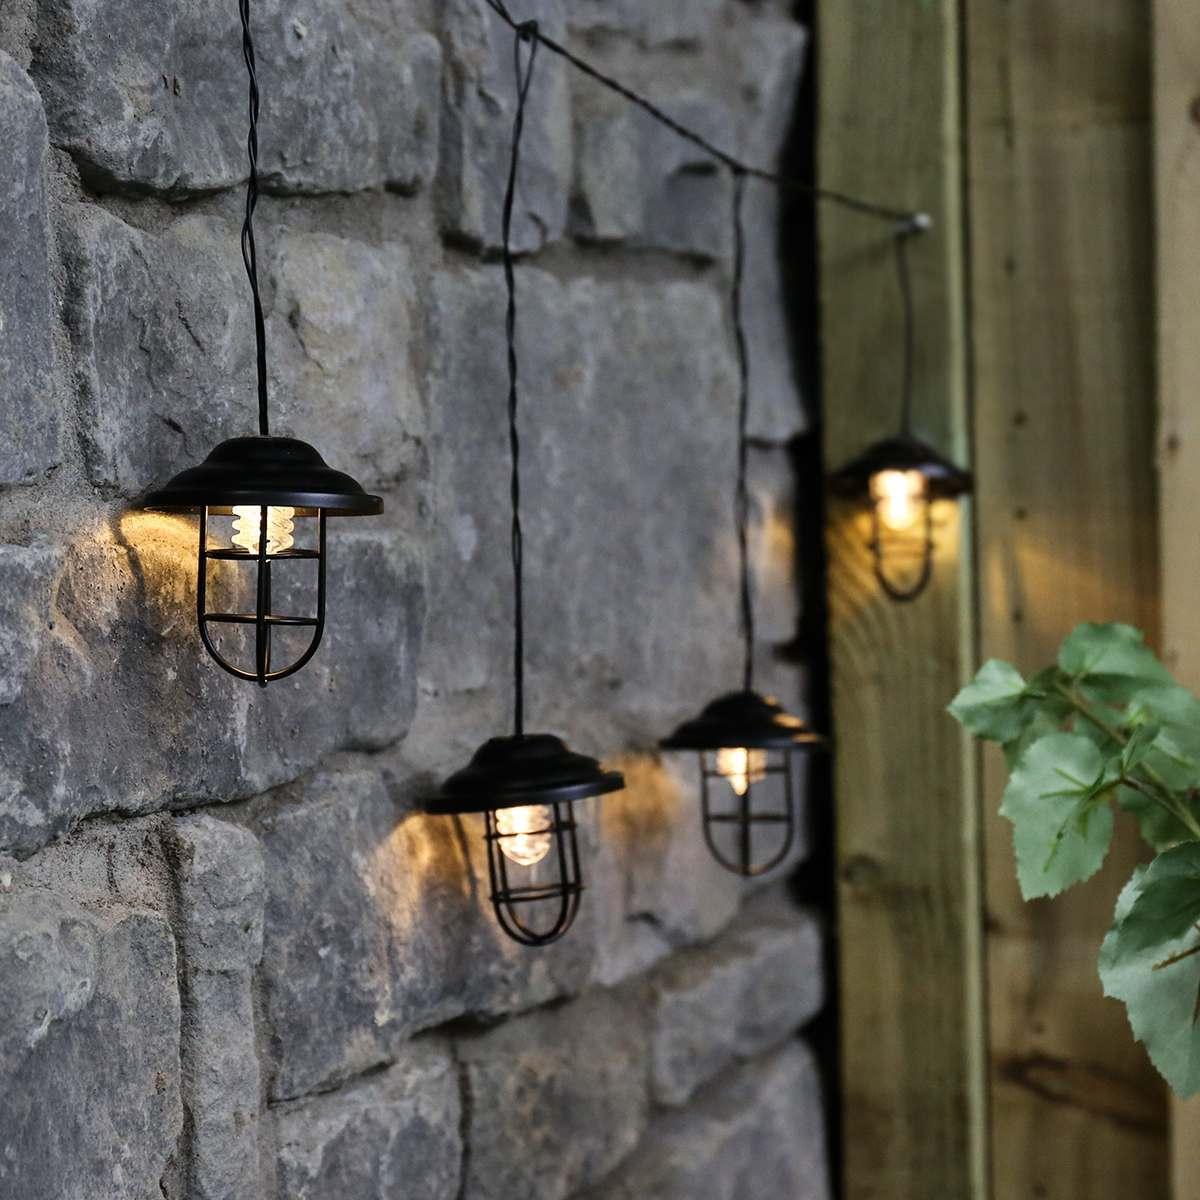 Outdoor String Lights Plug In : Outdoor Metal Plug In Lantern String Lights, Warm White LEDs, 1m